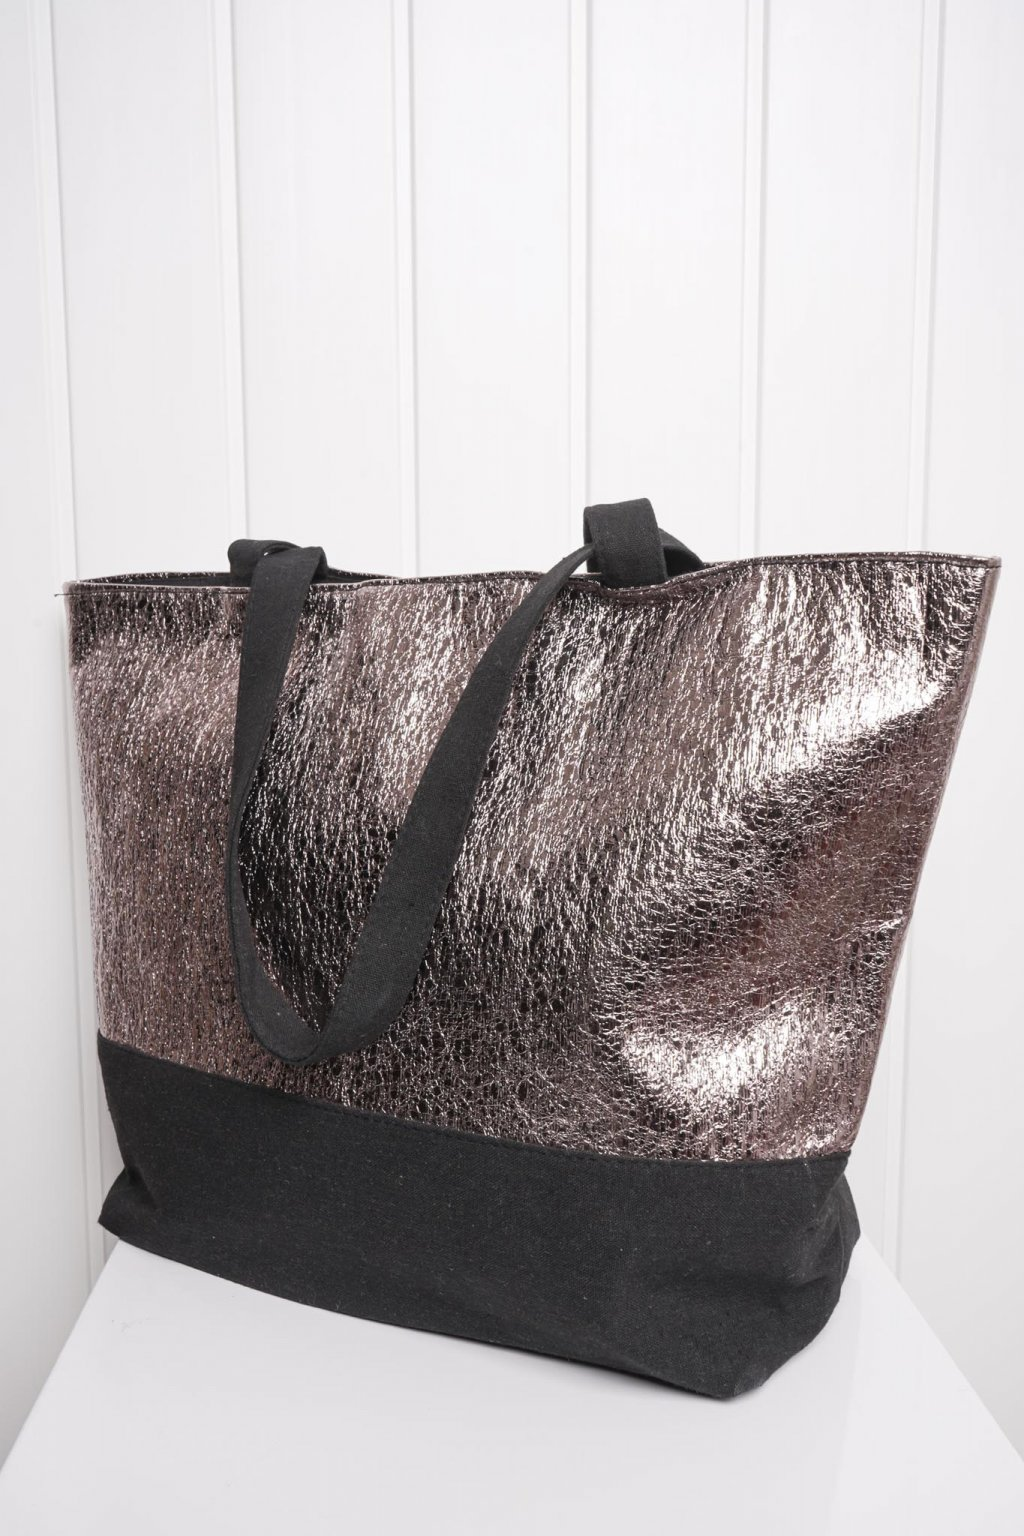 Kabelka, ruksak, dobrá cena, čierna kabelka, čierny ruksak, basic, kabelky, ruksaky 154